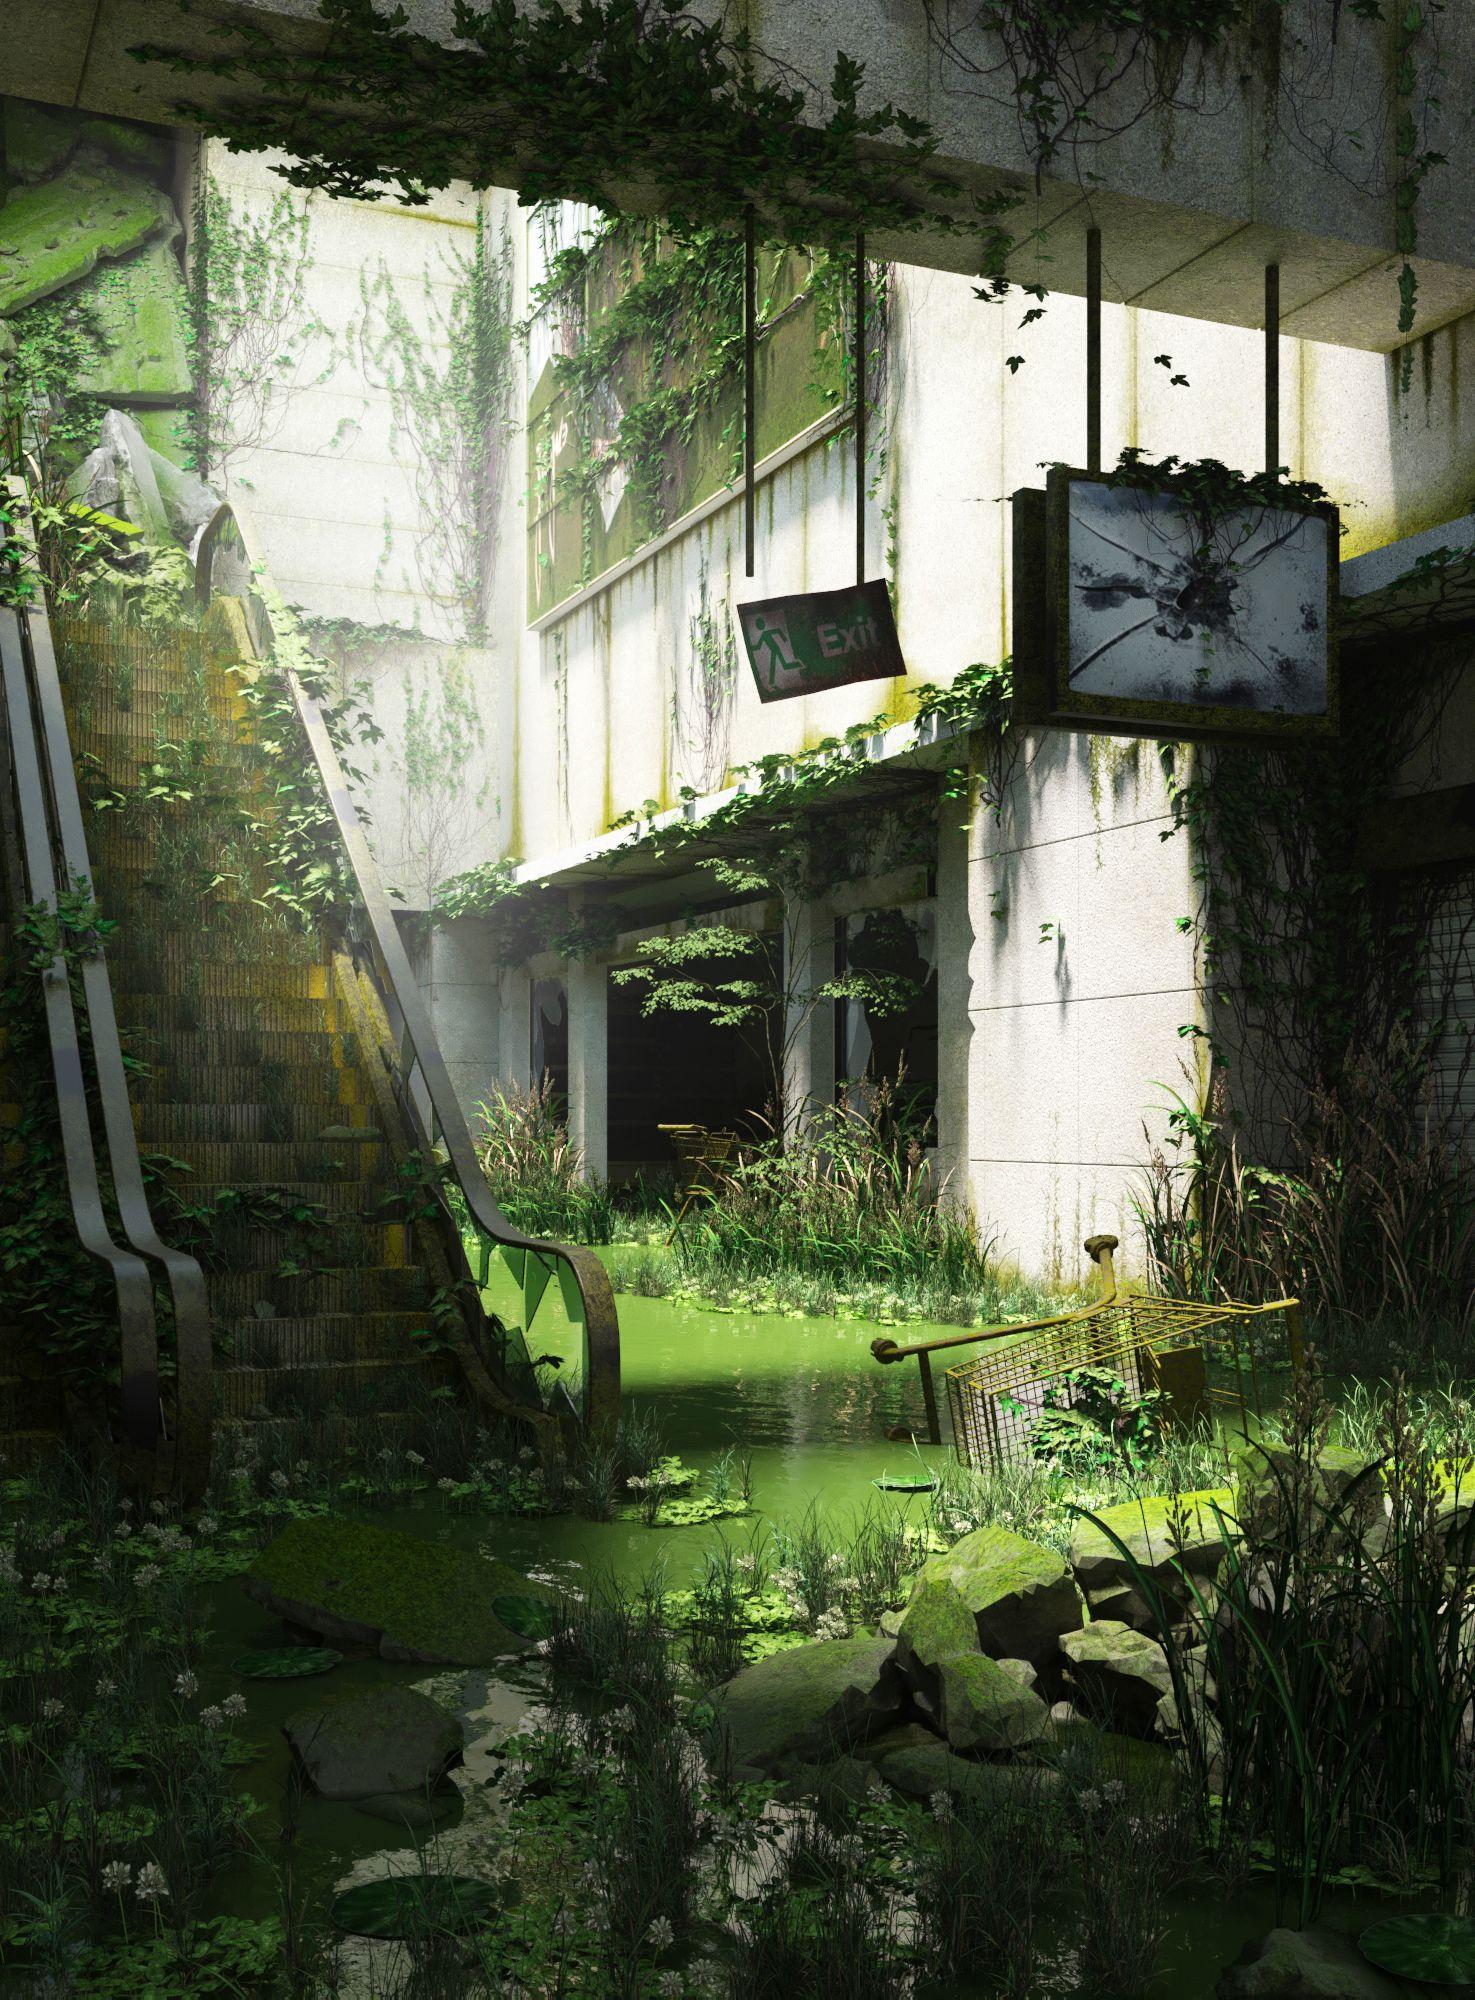 Post-apocalypse #abandonedplaces